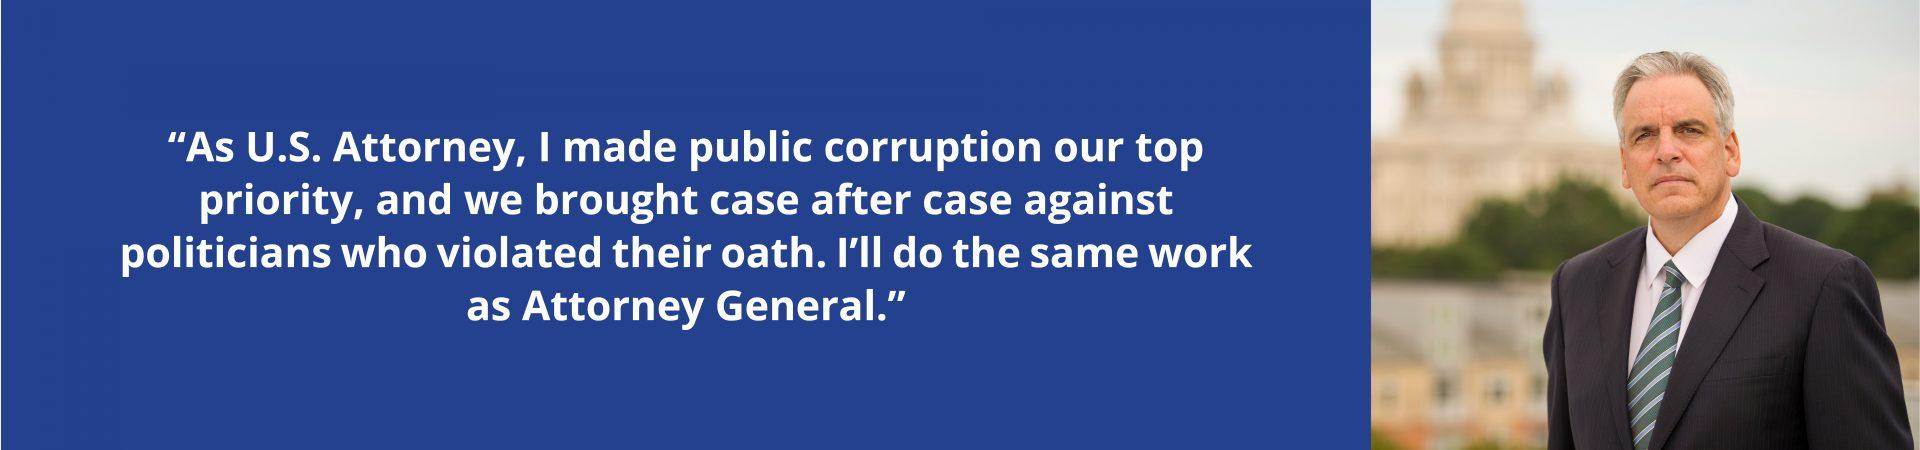 public integrity header 4